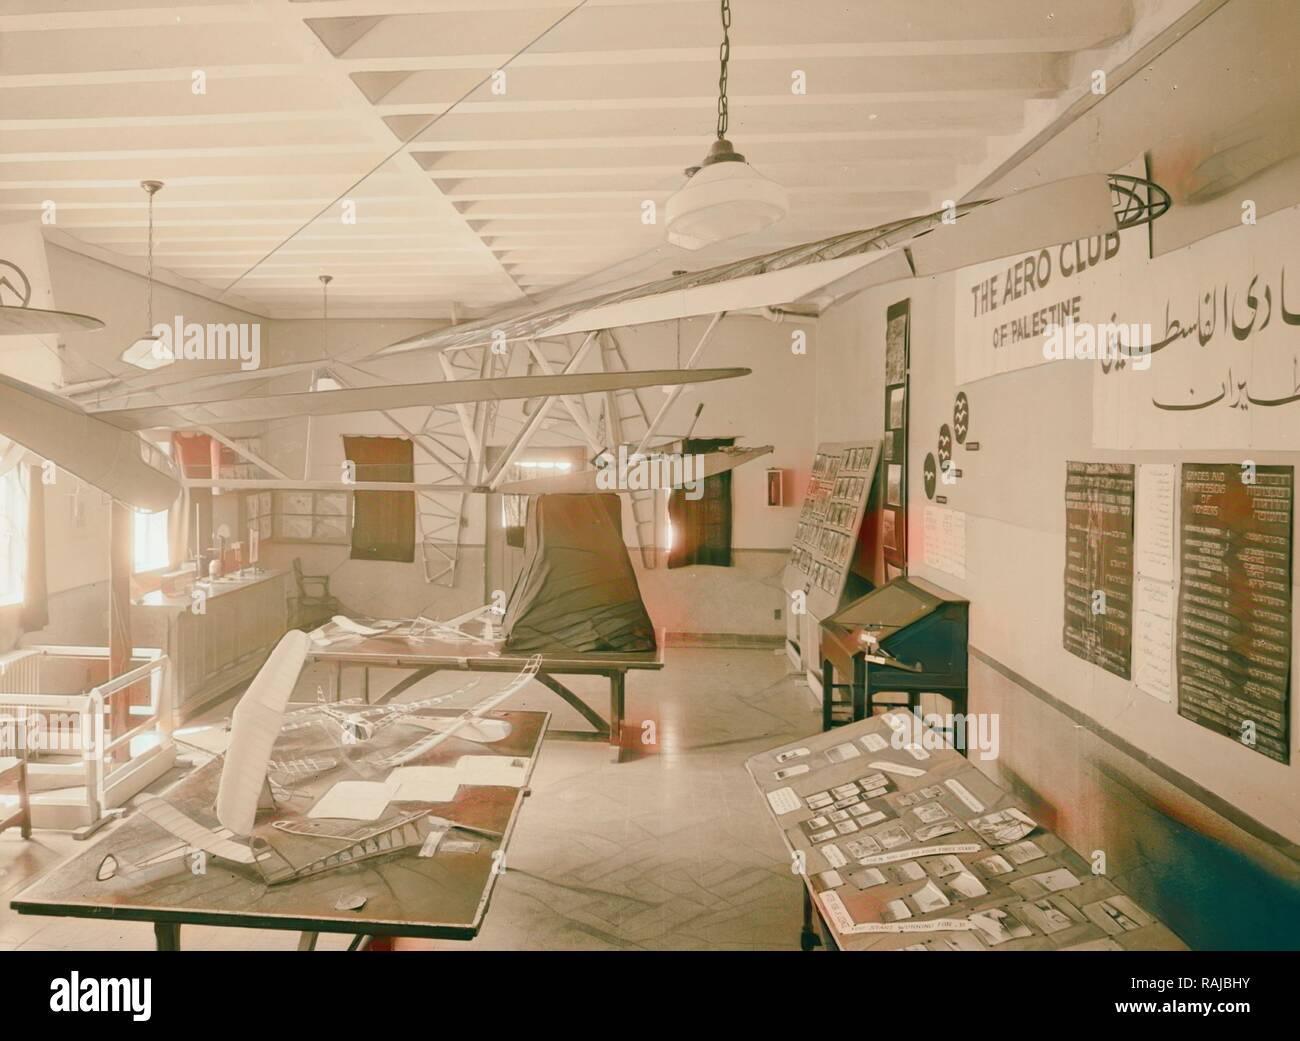 Y aeronautic exhibit, Apr. 1, 1944, Jerusalem, Israel. Reimagined by Gibon. Classic art with a modern twist reimagined - Stock Image